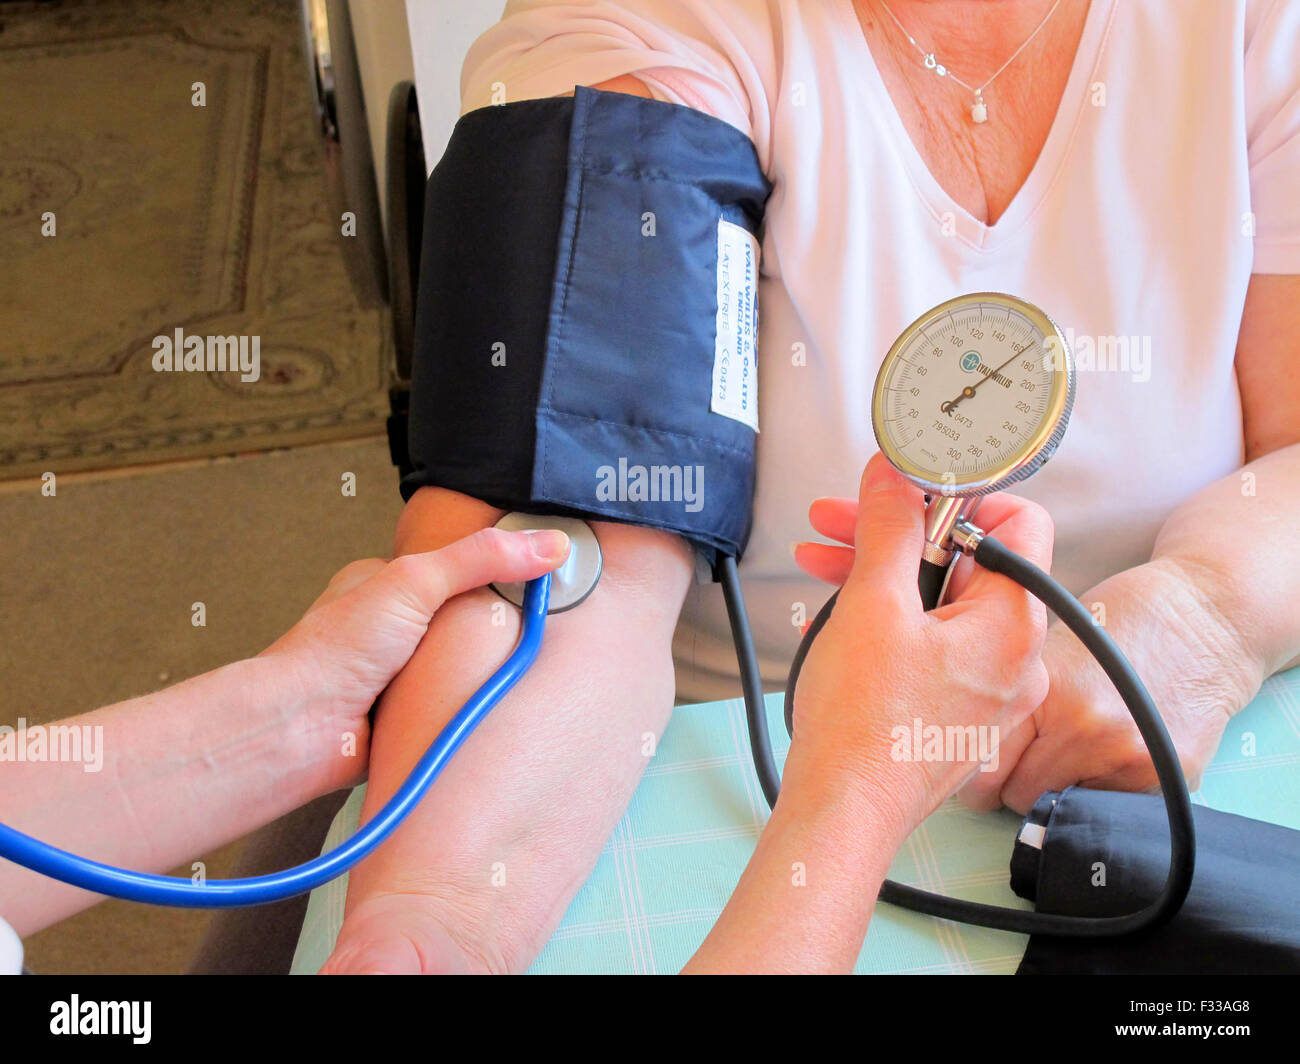 SUTTON-IN-ASHFIELD, NOTTINGHAMSHIRE, UK. JUNE 24, 2015. A care nurse taking a stroke patient's blood pressure - Stock Image